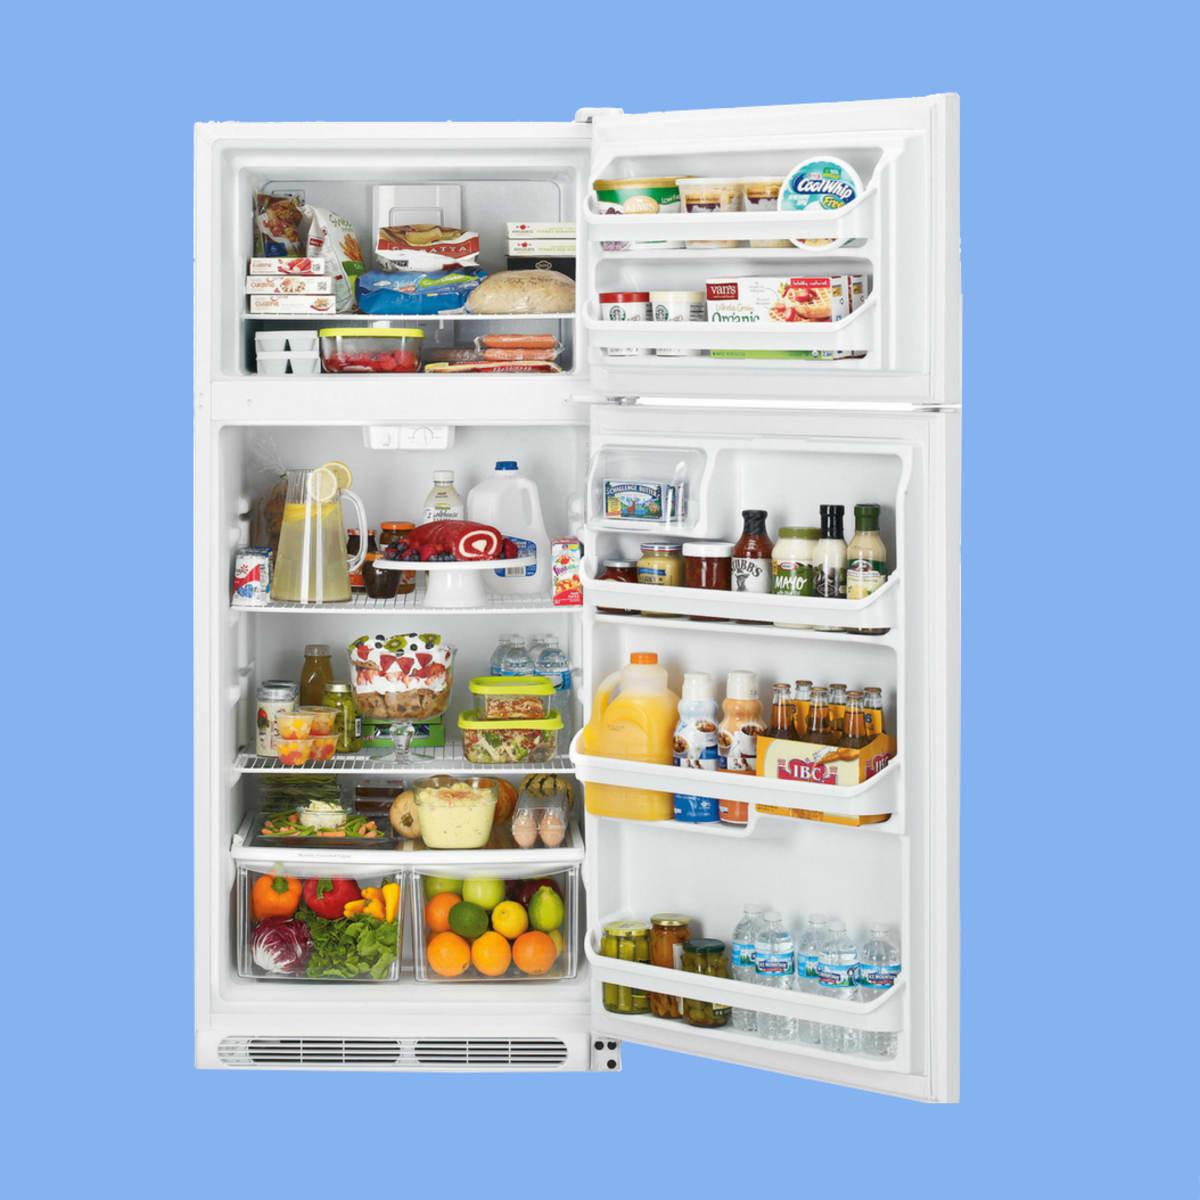 Kenmore 60412 Top Freezer Refrigerator Review - Reviewed Refrigerators